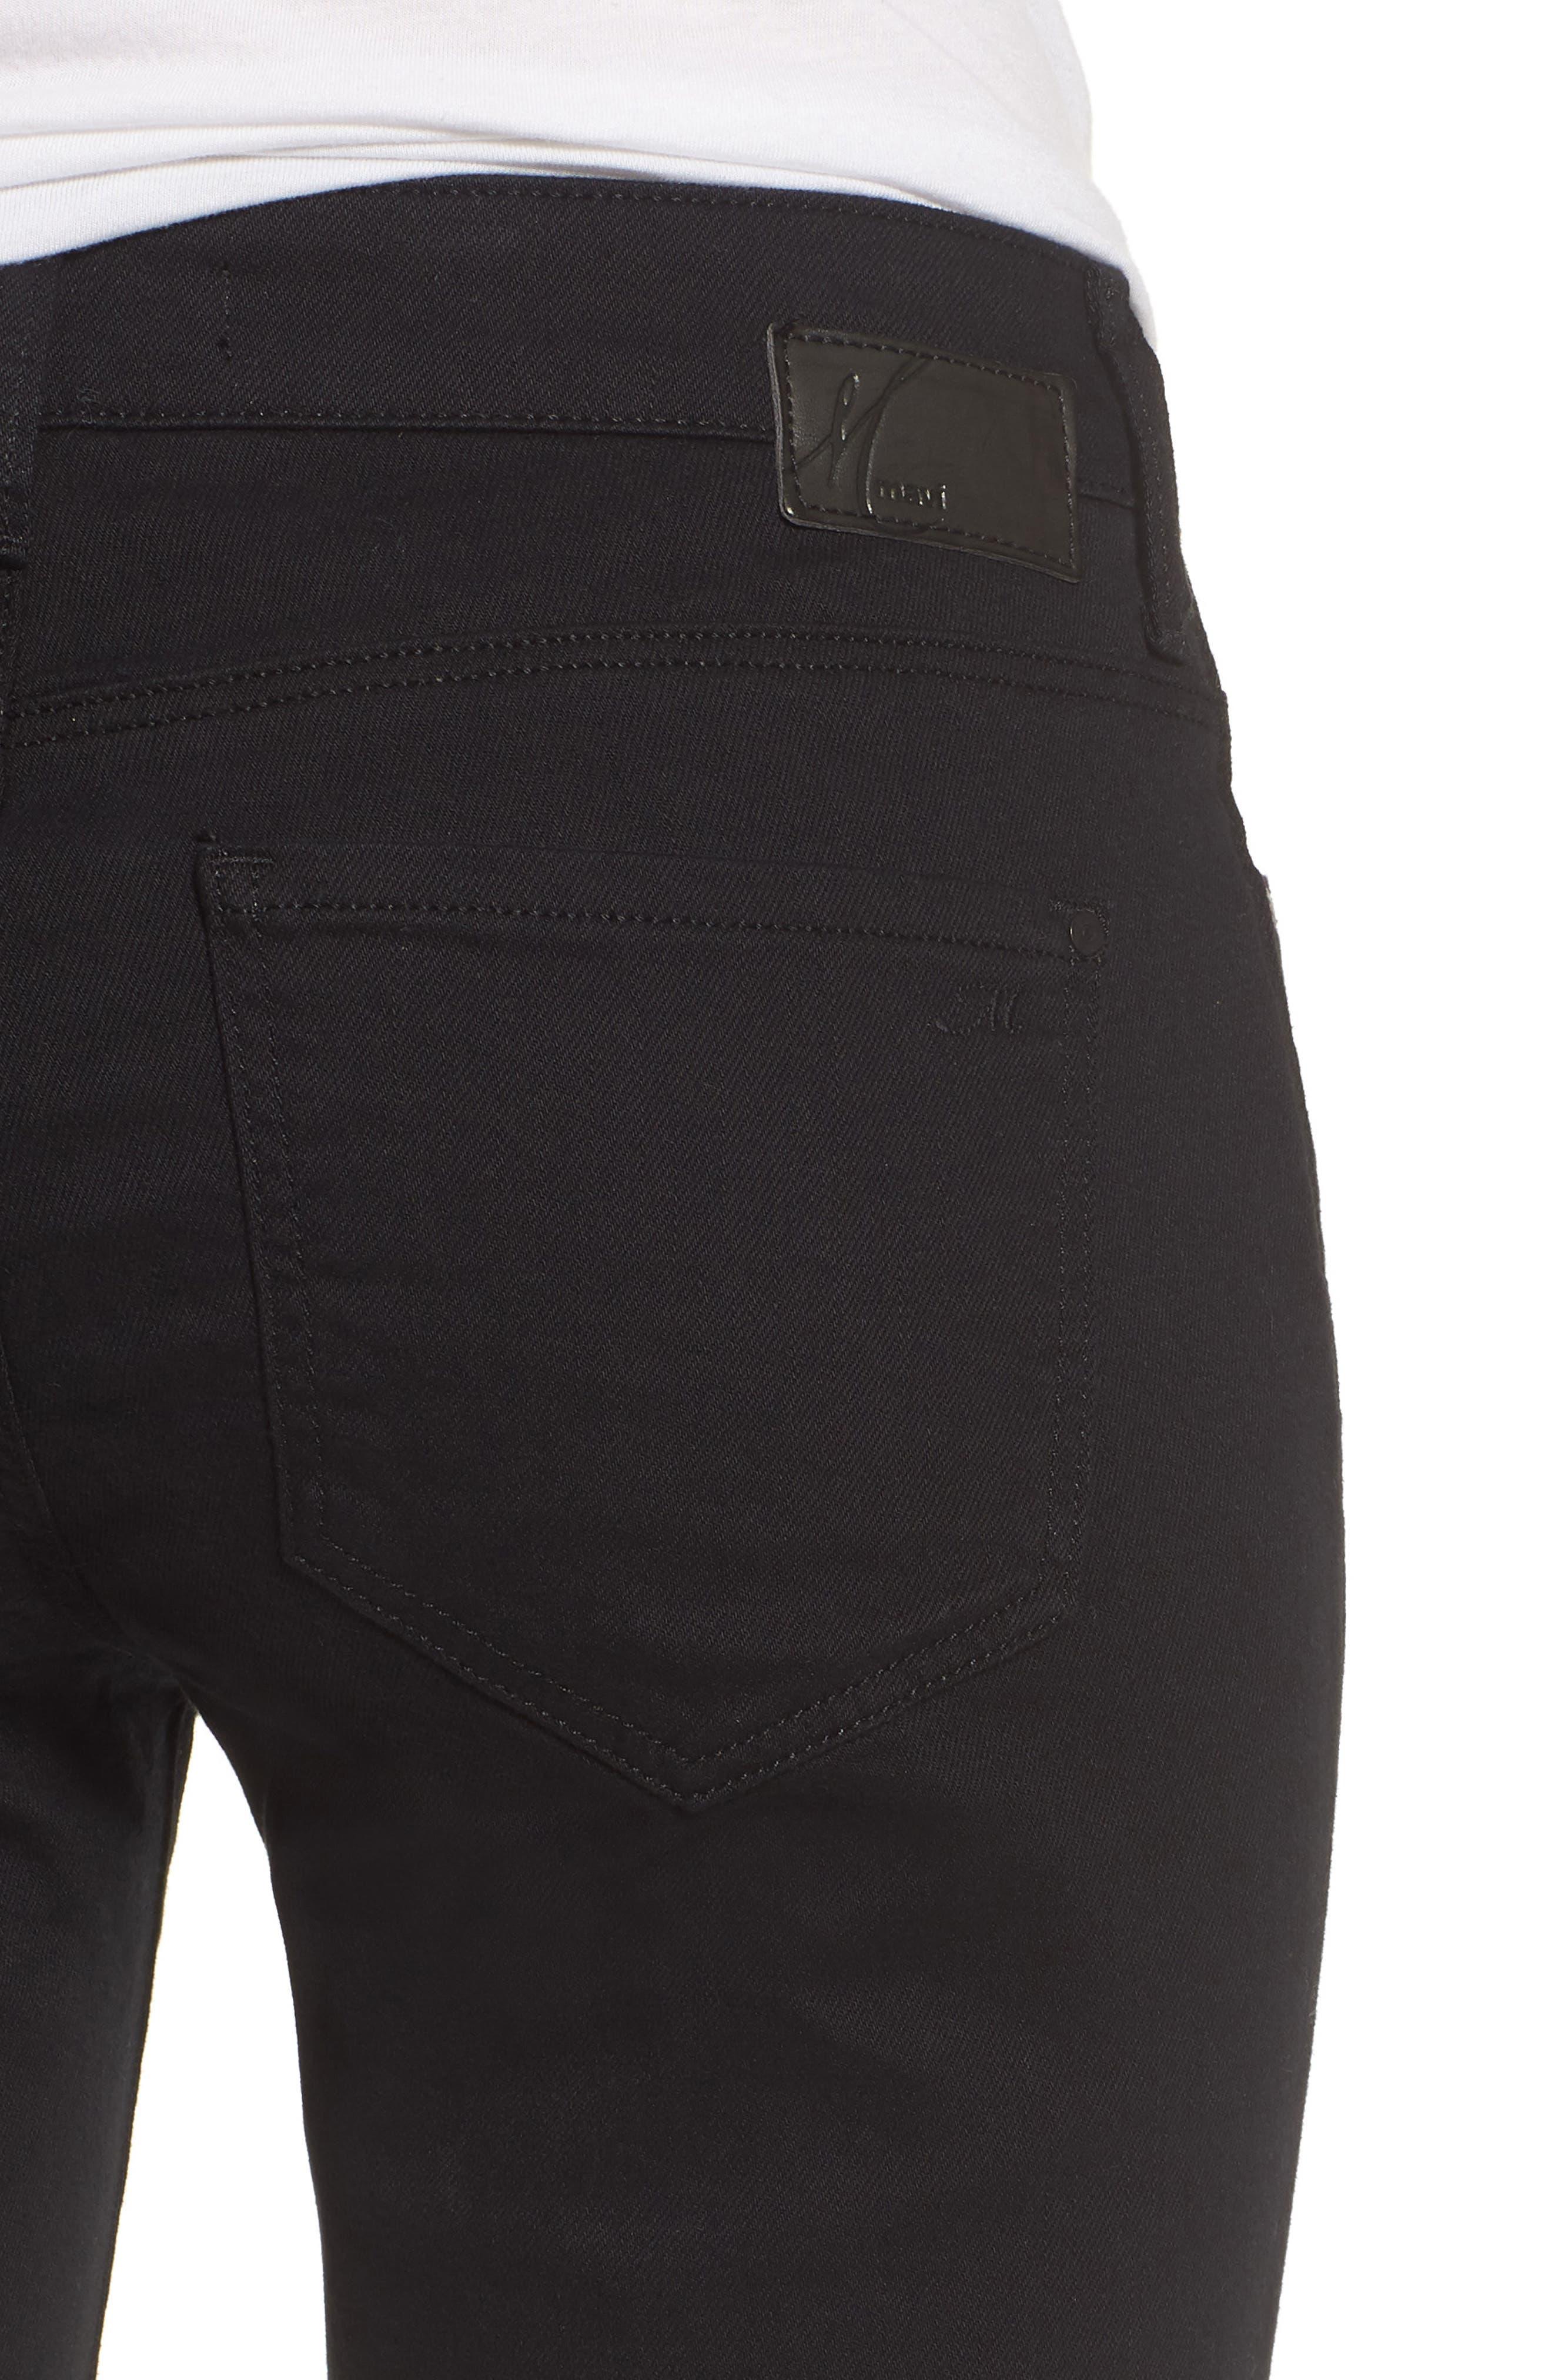 Karly Black Nolita Roll Cuff Bermuda Shorts,                             Alternate thumbnail 4, color,                             001